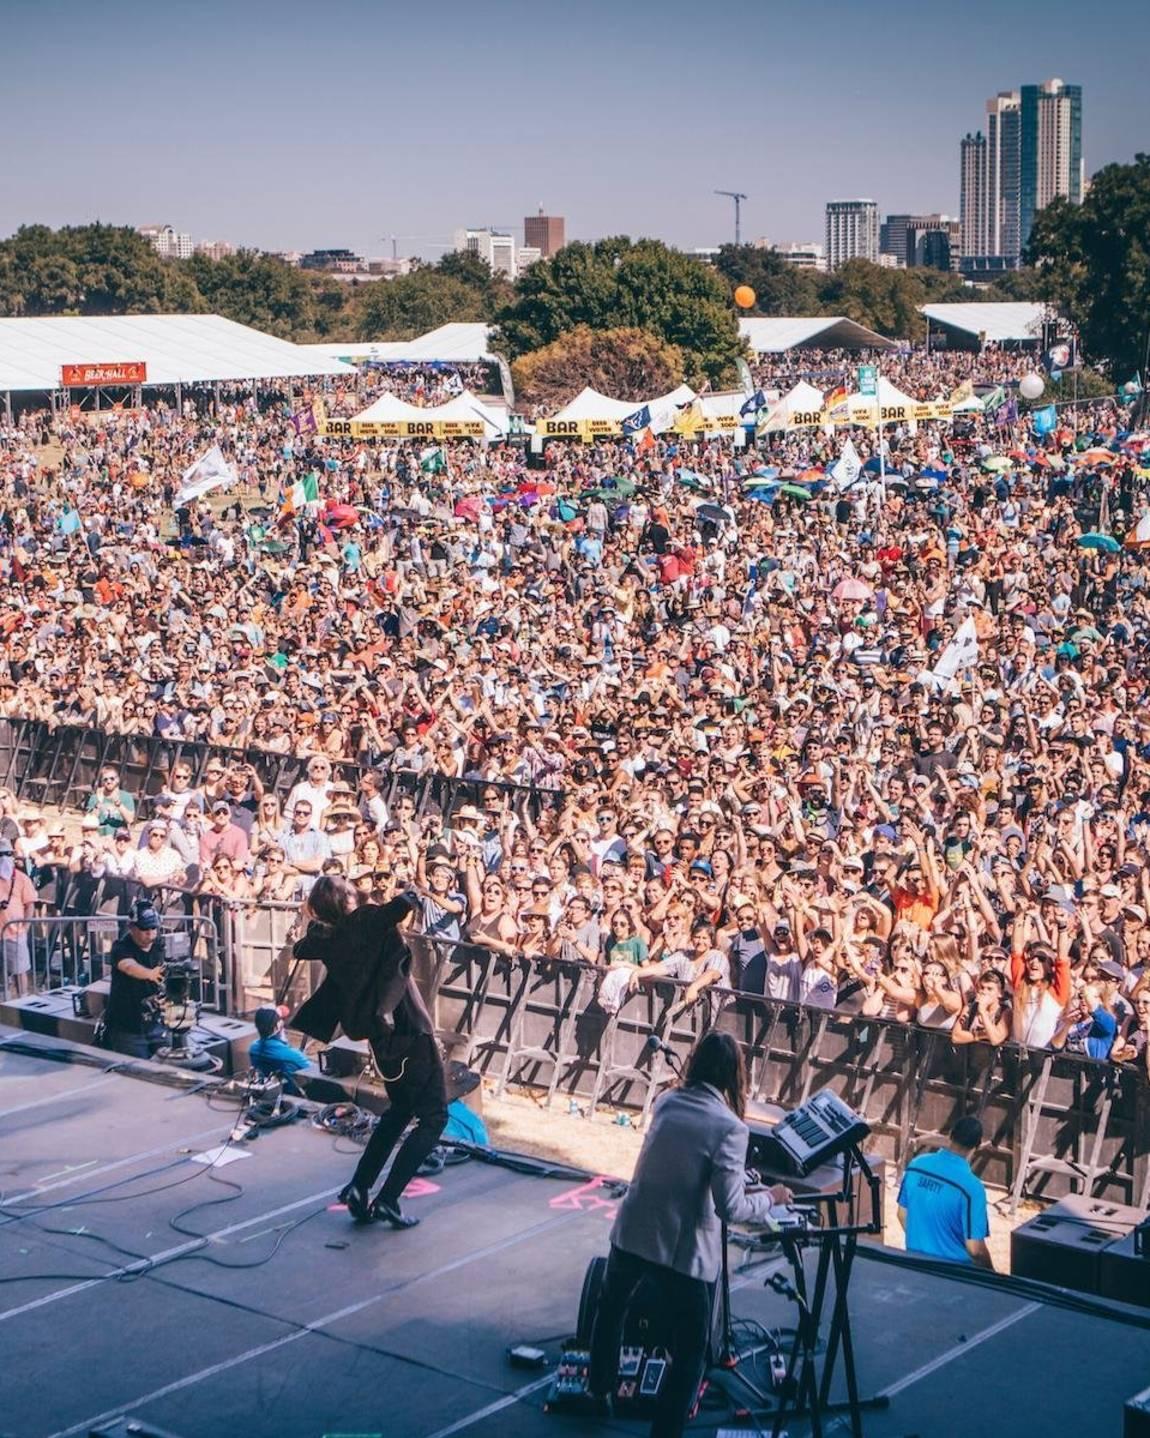 acl festival live stream 2020